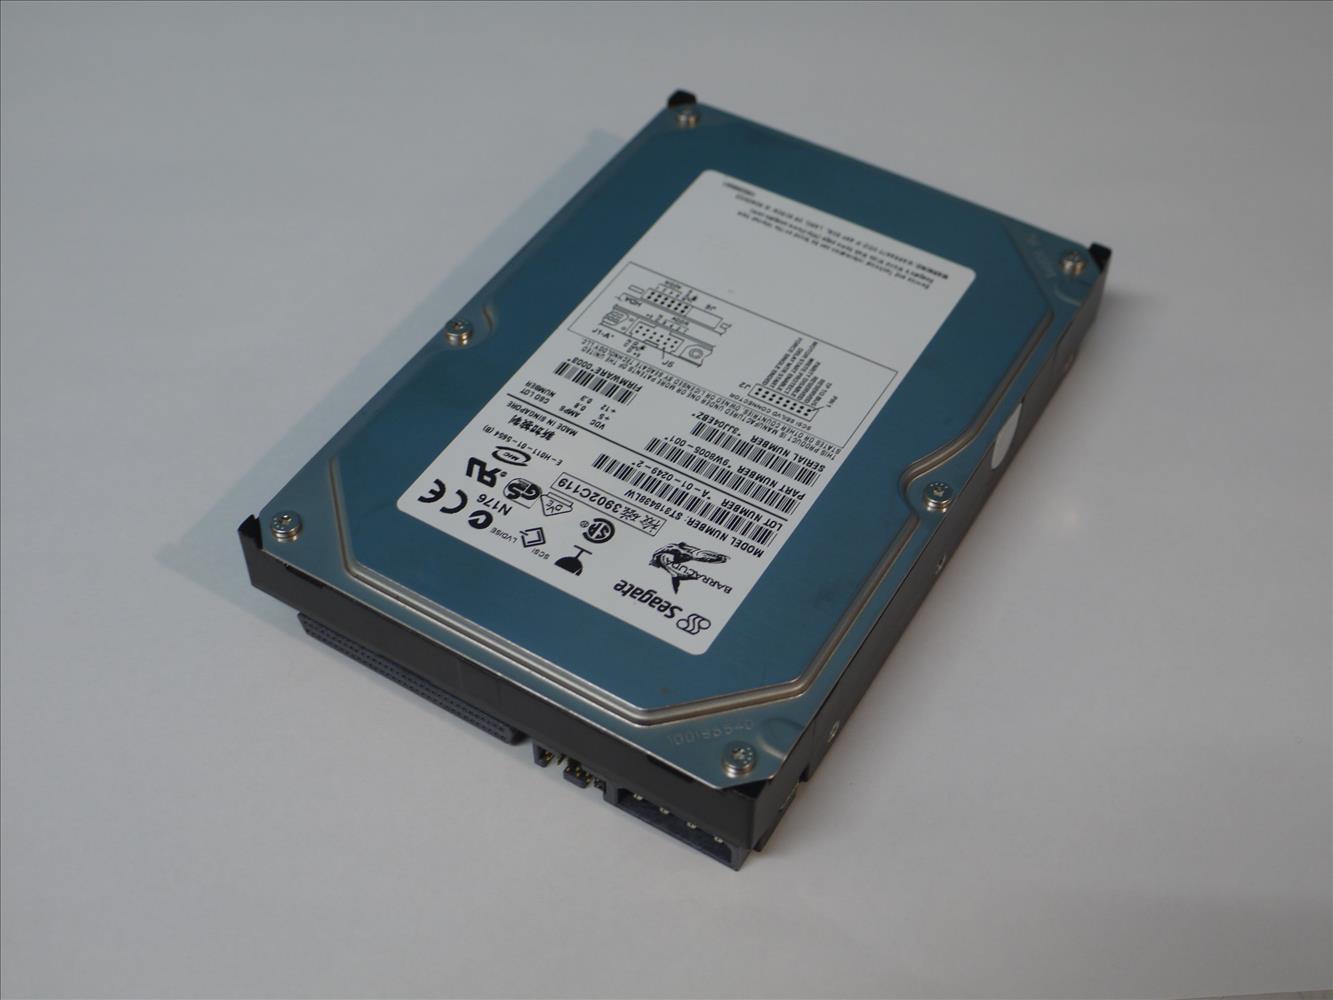 ST318438LW Seagate 18GB 7200rpm 3.5インチ Ultra-160 SCSI 68Pin 【中古】【送料無料セール中! (大型商品は対象外)】